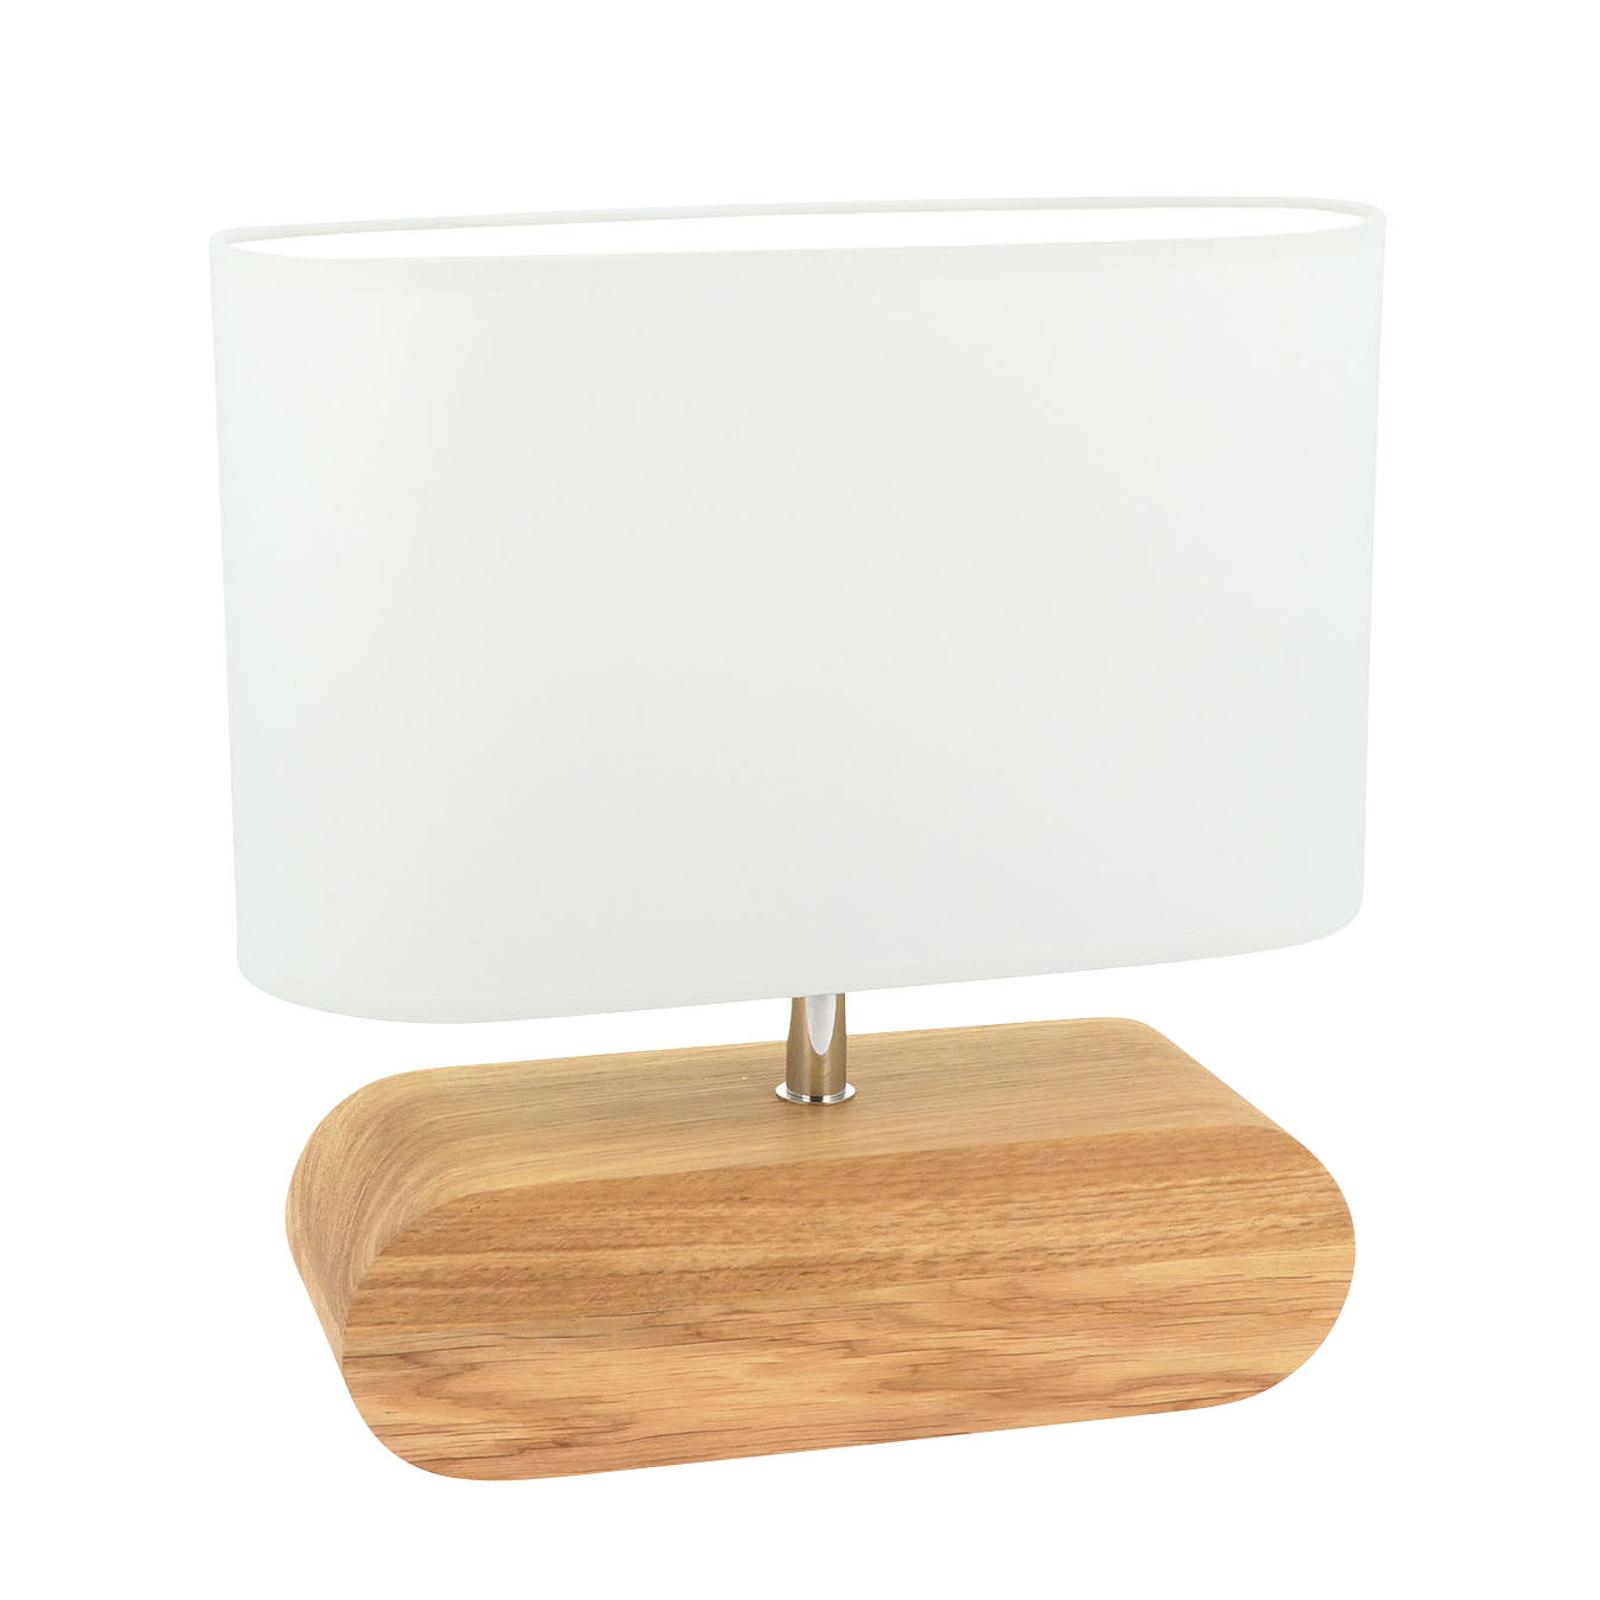 Tafellamp Marinna, voet eiken, kap wit